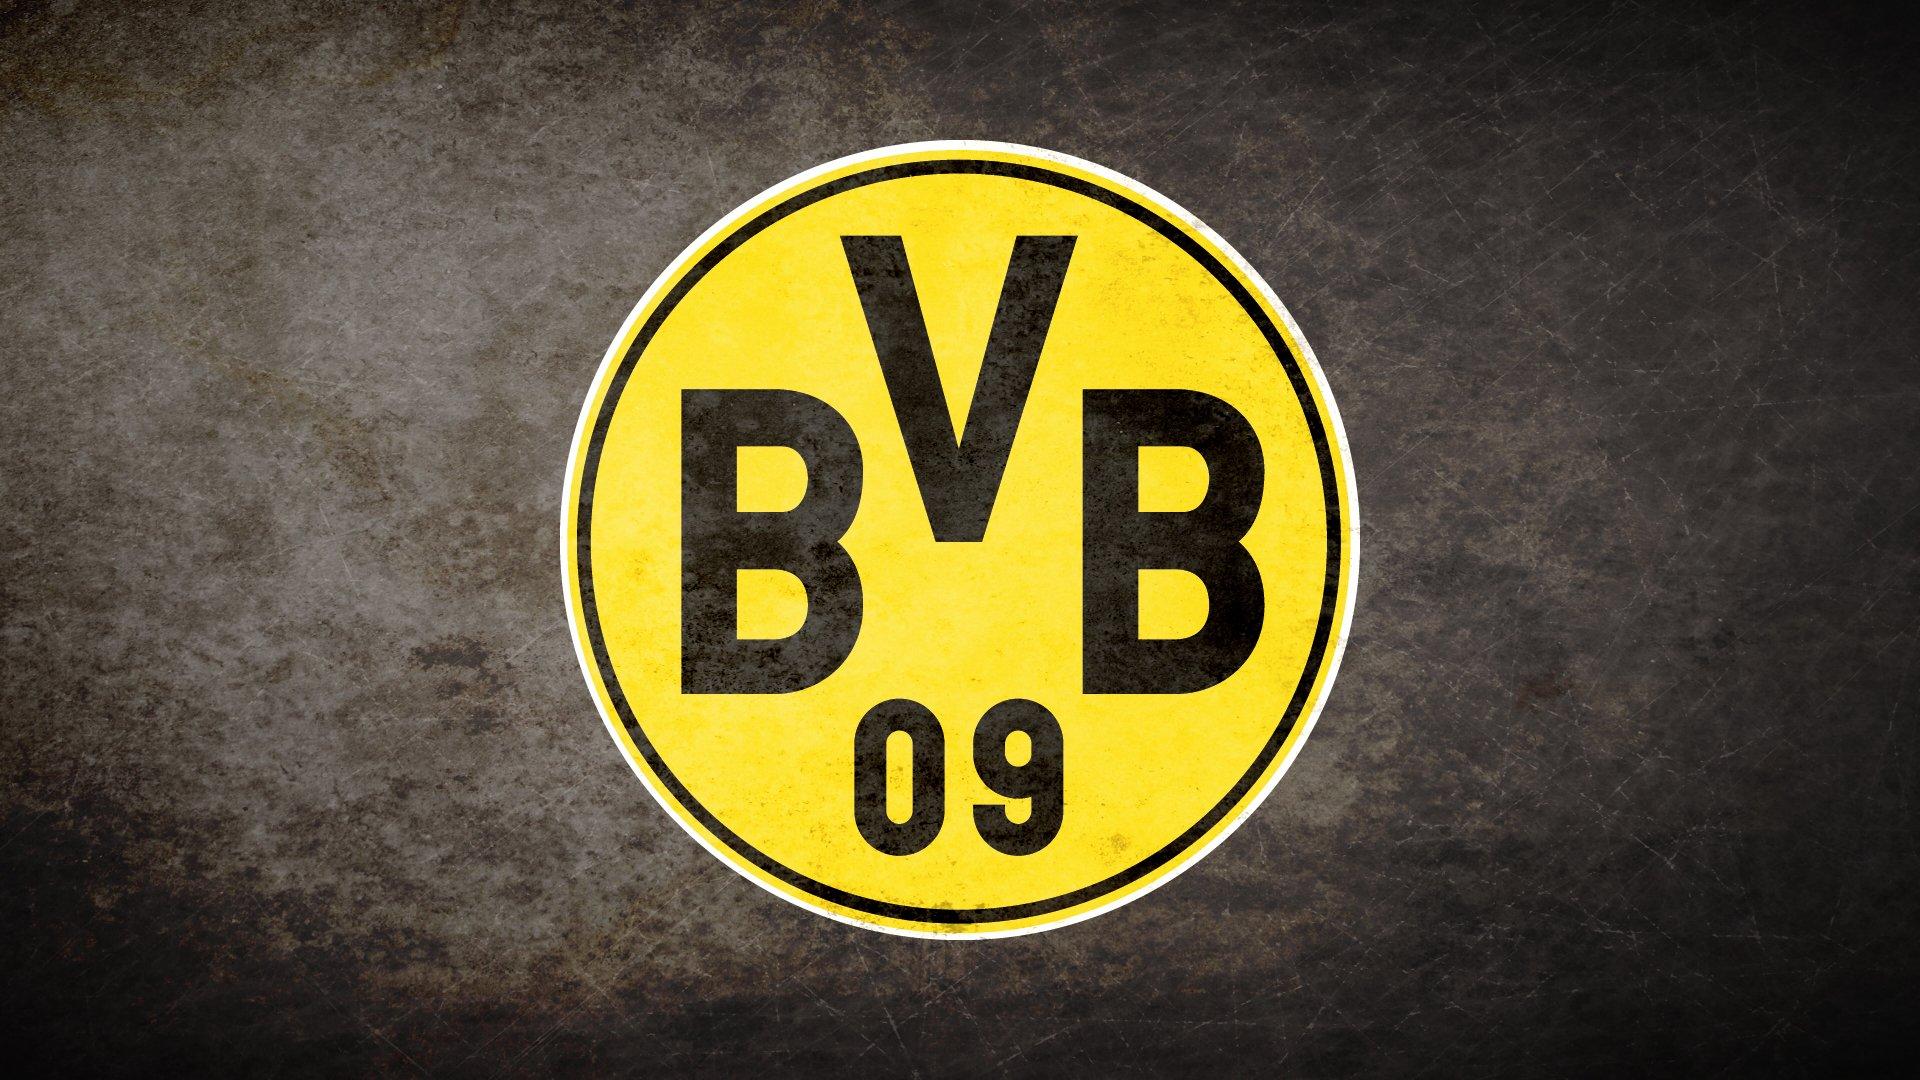 Borussia Dortmund Hd Wallpaper Background Image 1920x1080 Id 1024982 Wallpaper Abyss